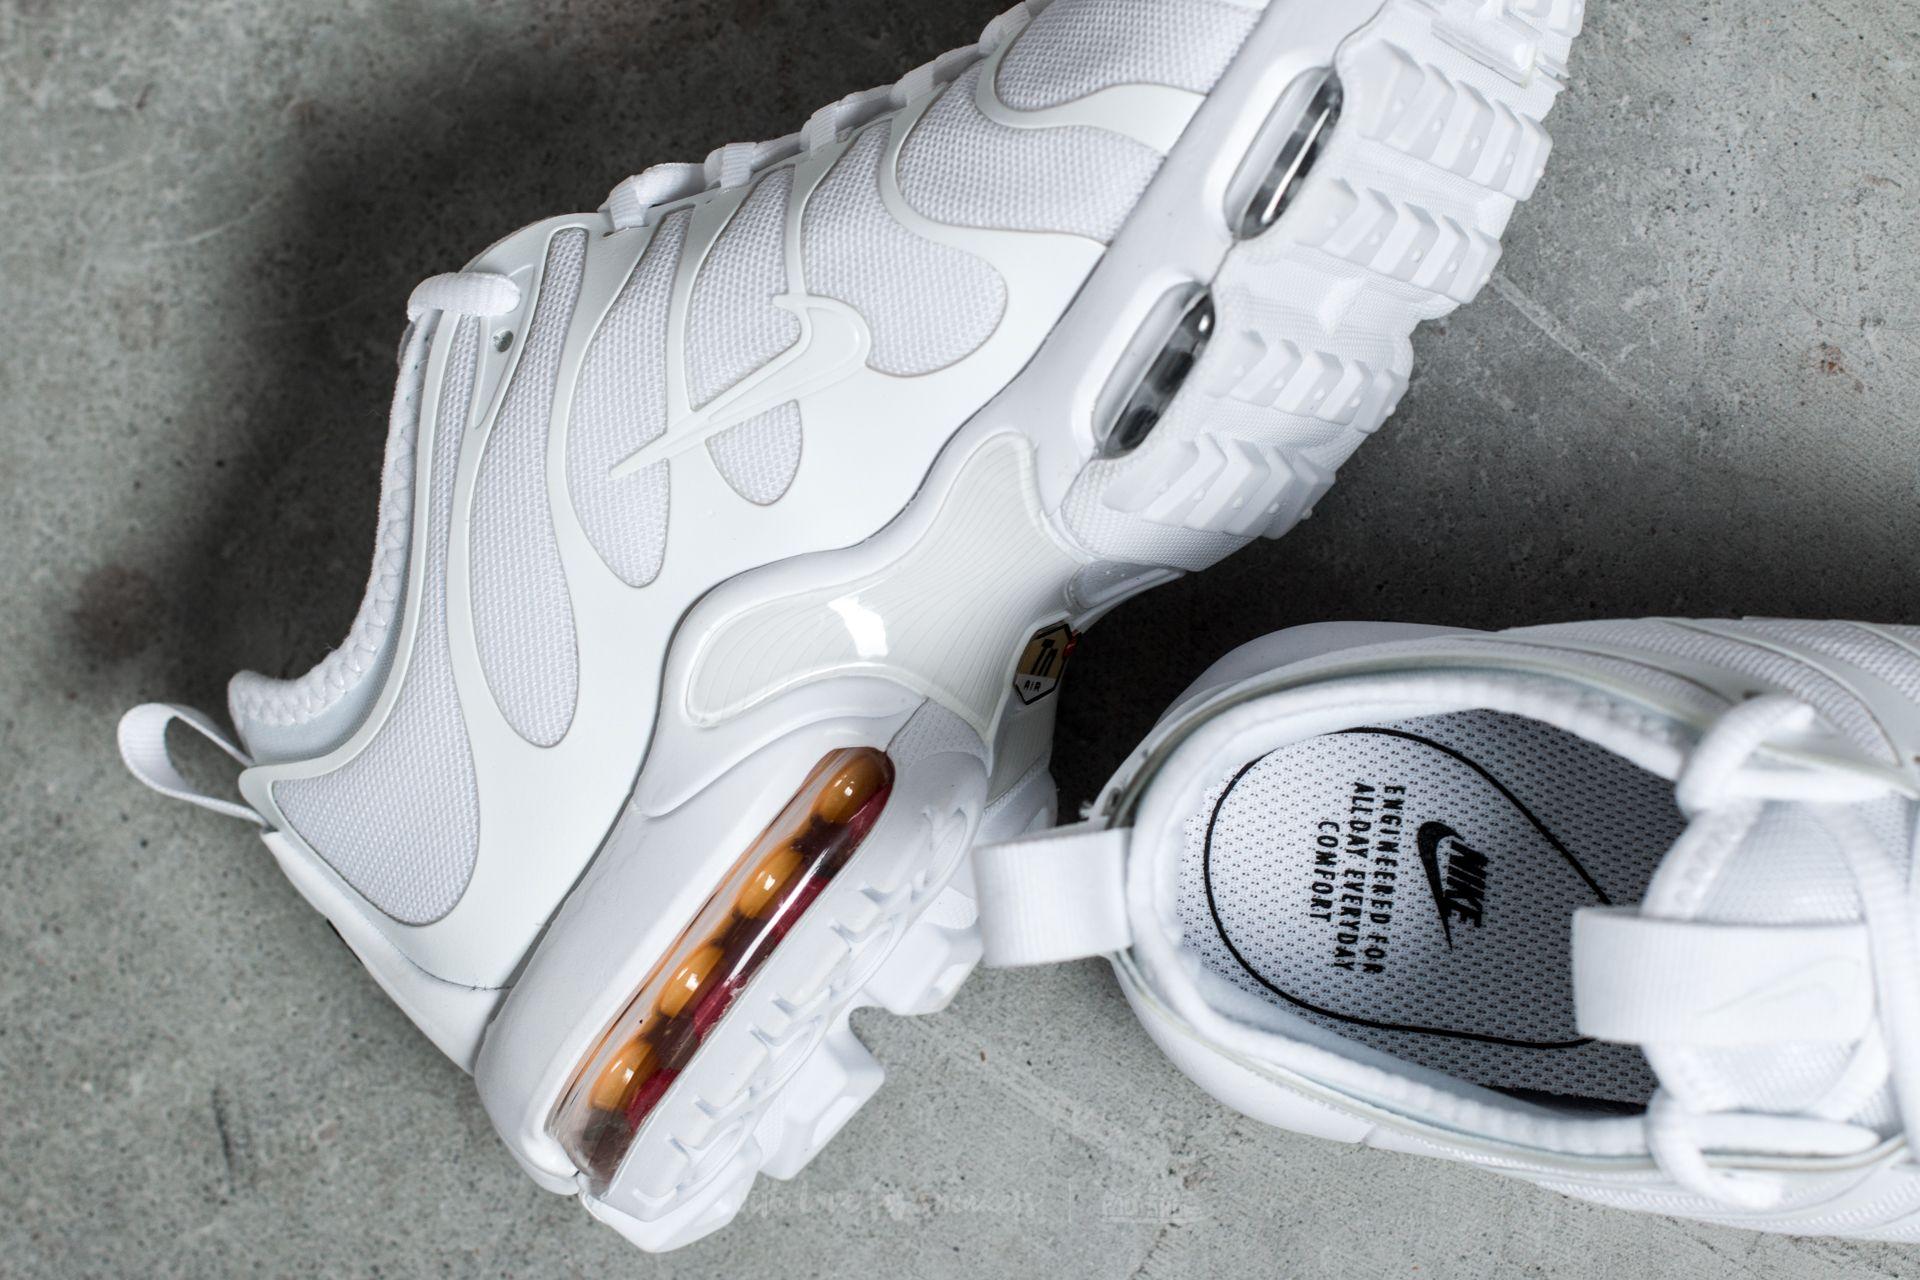 Nike Wmns Air Max Plus Tn Ultra White White Black Footshop  Footshop